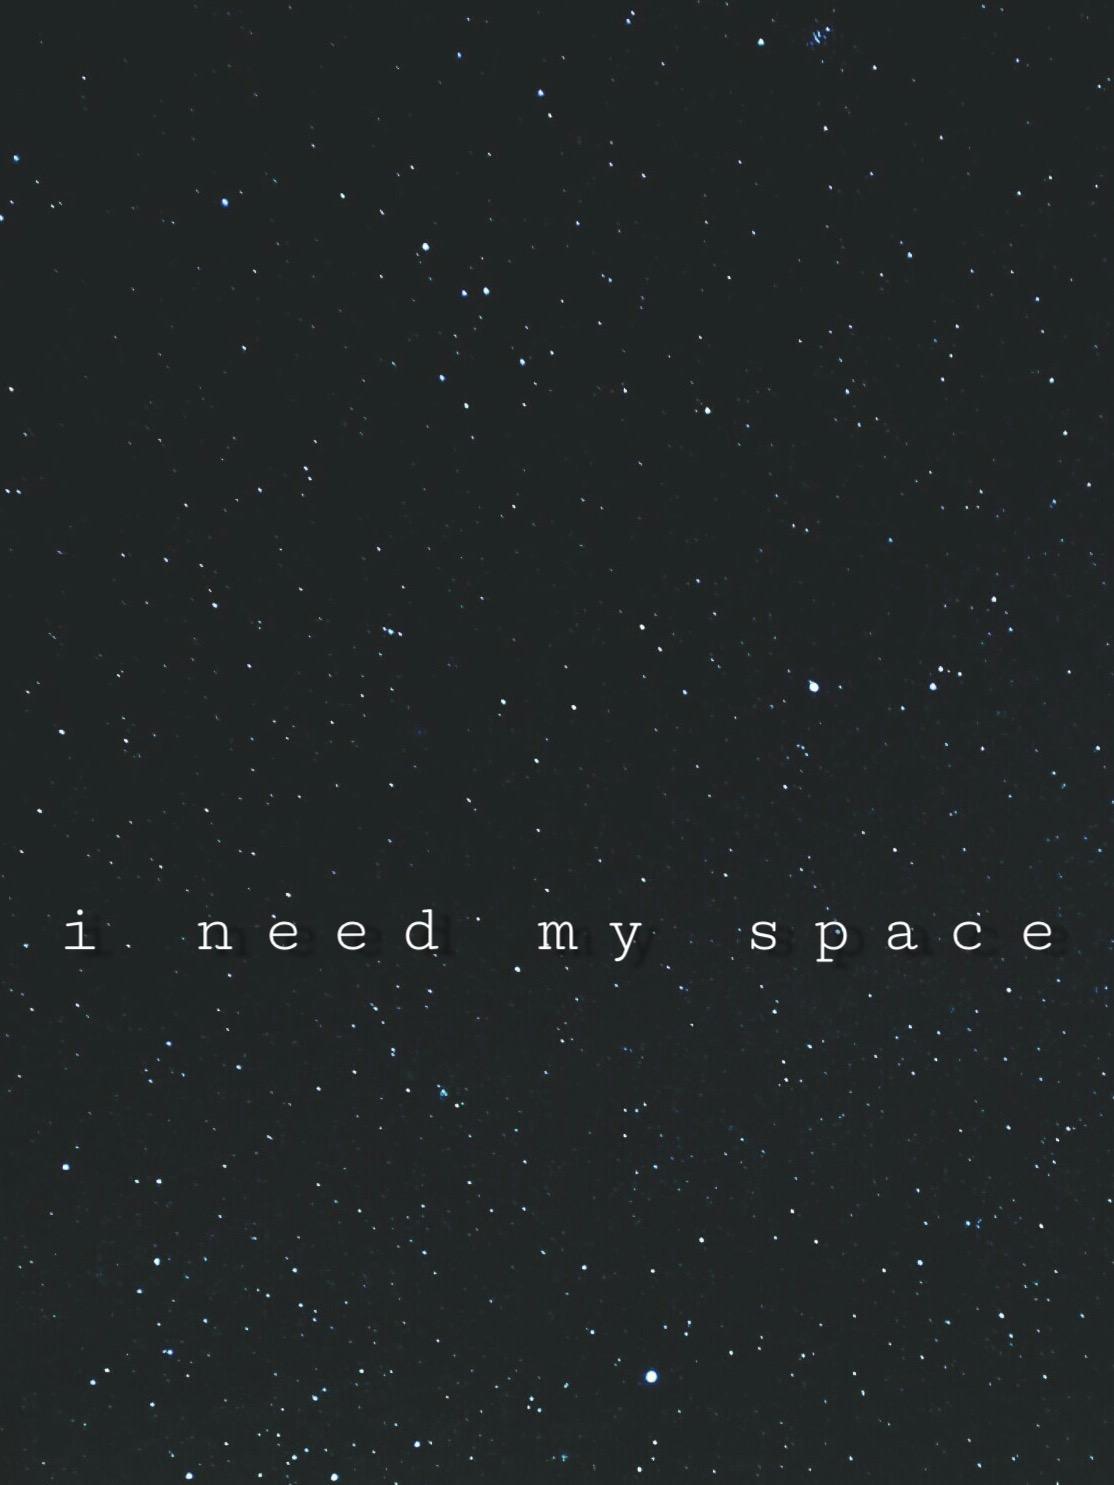 freetoedit space aesthetic